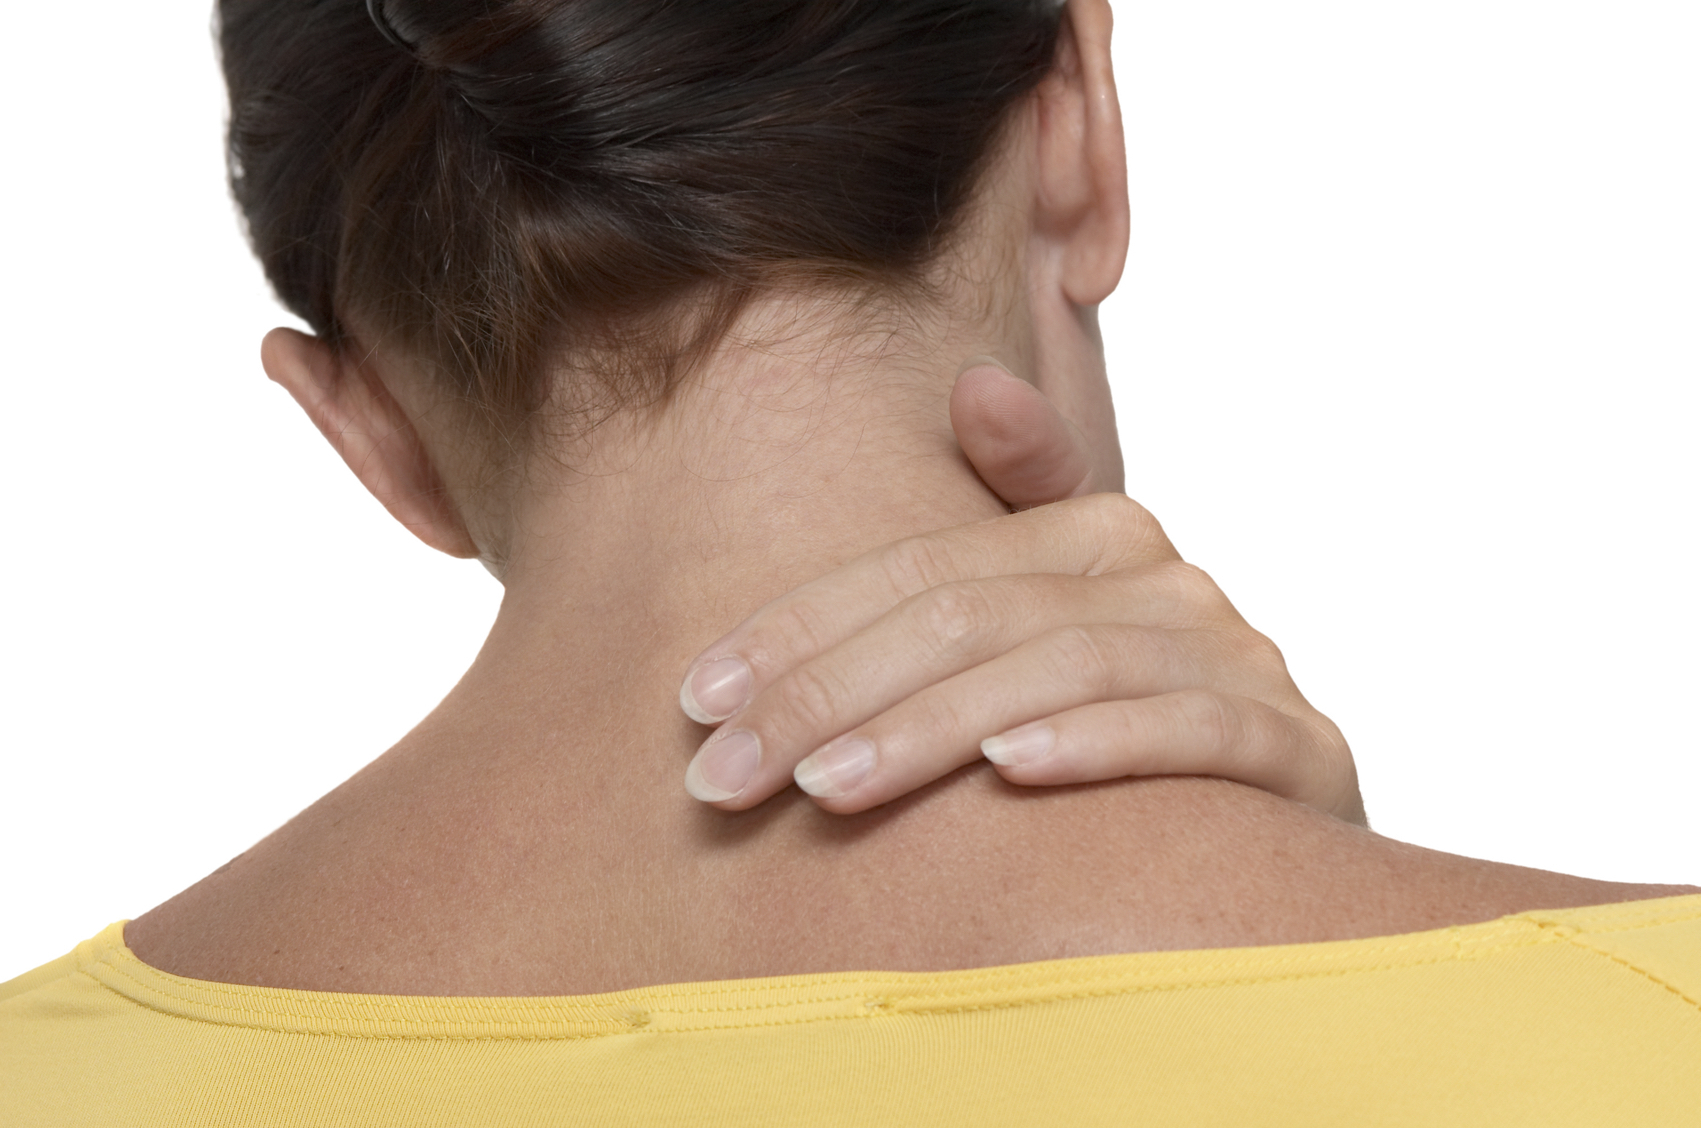 4 rimedi naturali per la cervicale